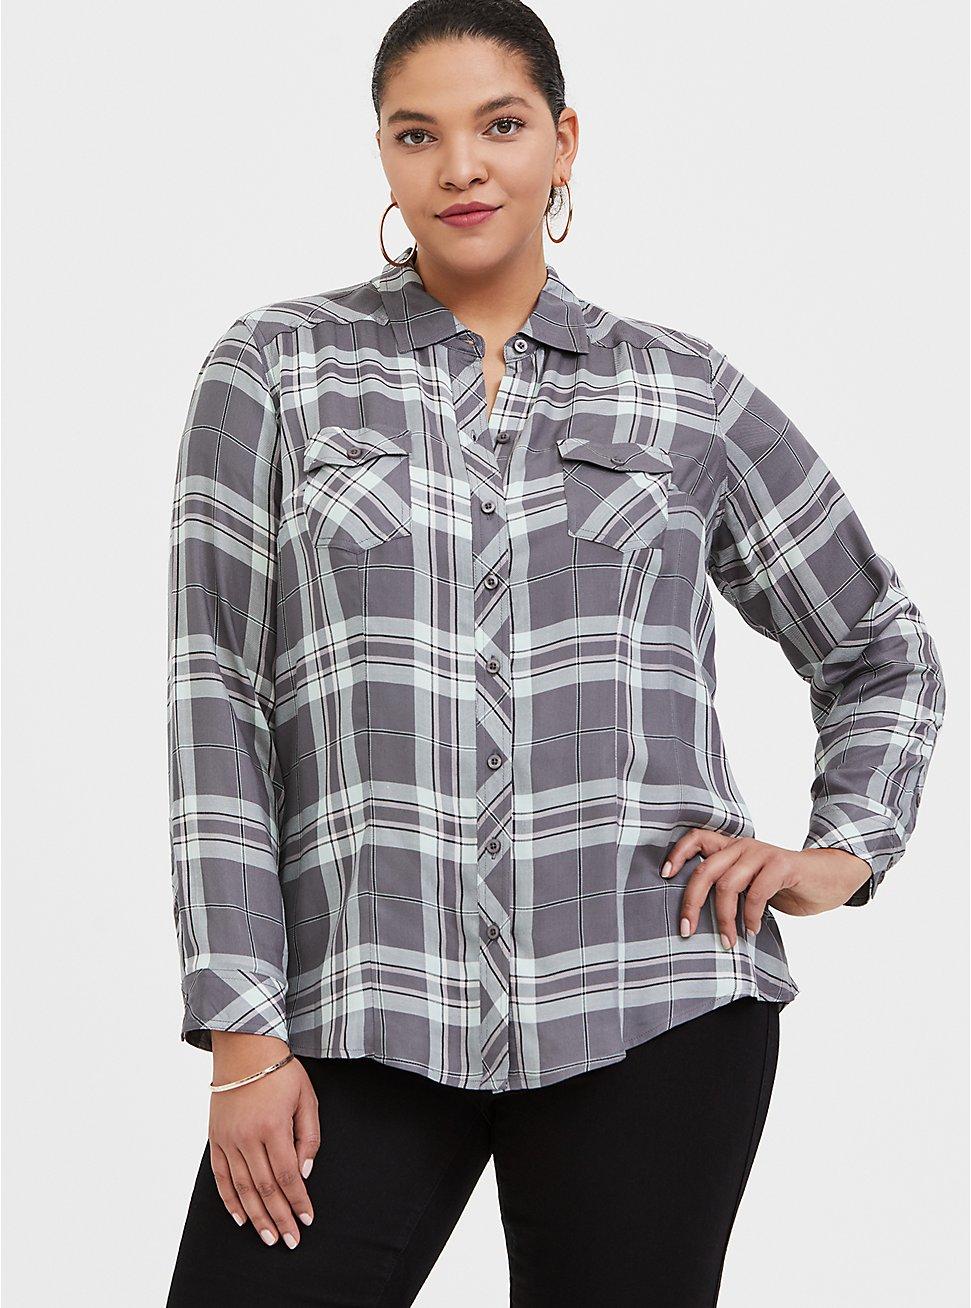 Plus Size Taylor - Grey Plaid Twill Button Front Slim Fit Shirt, PLAID - GREY, hi-res